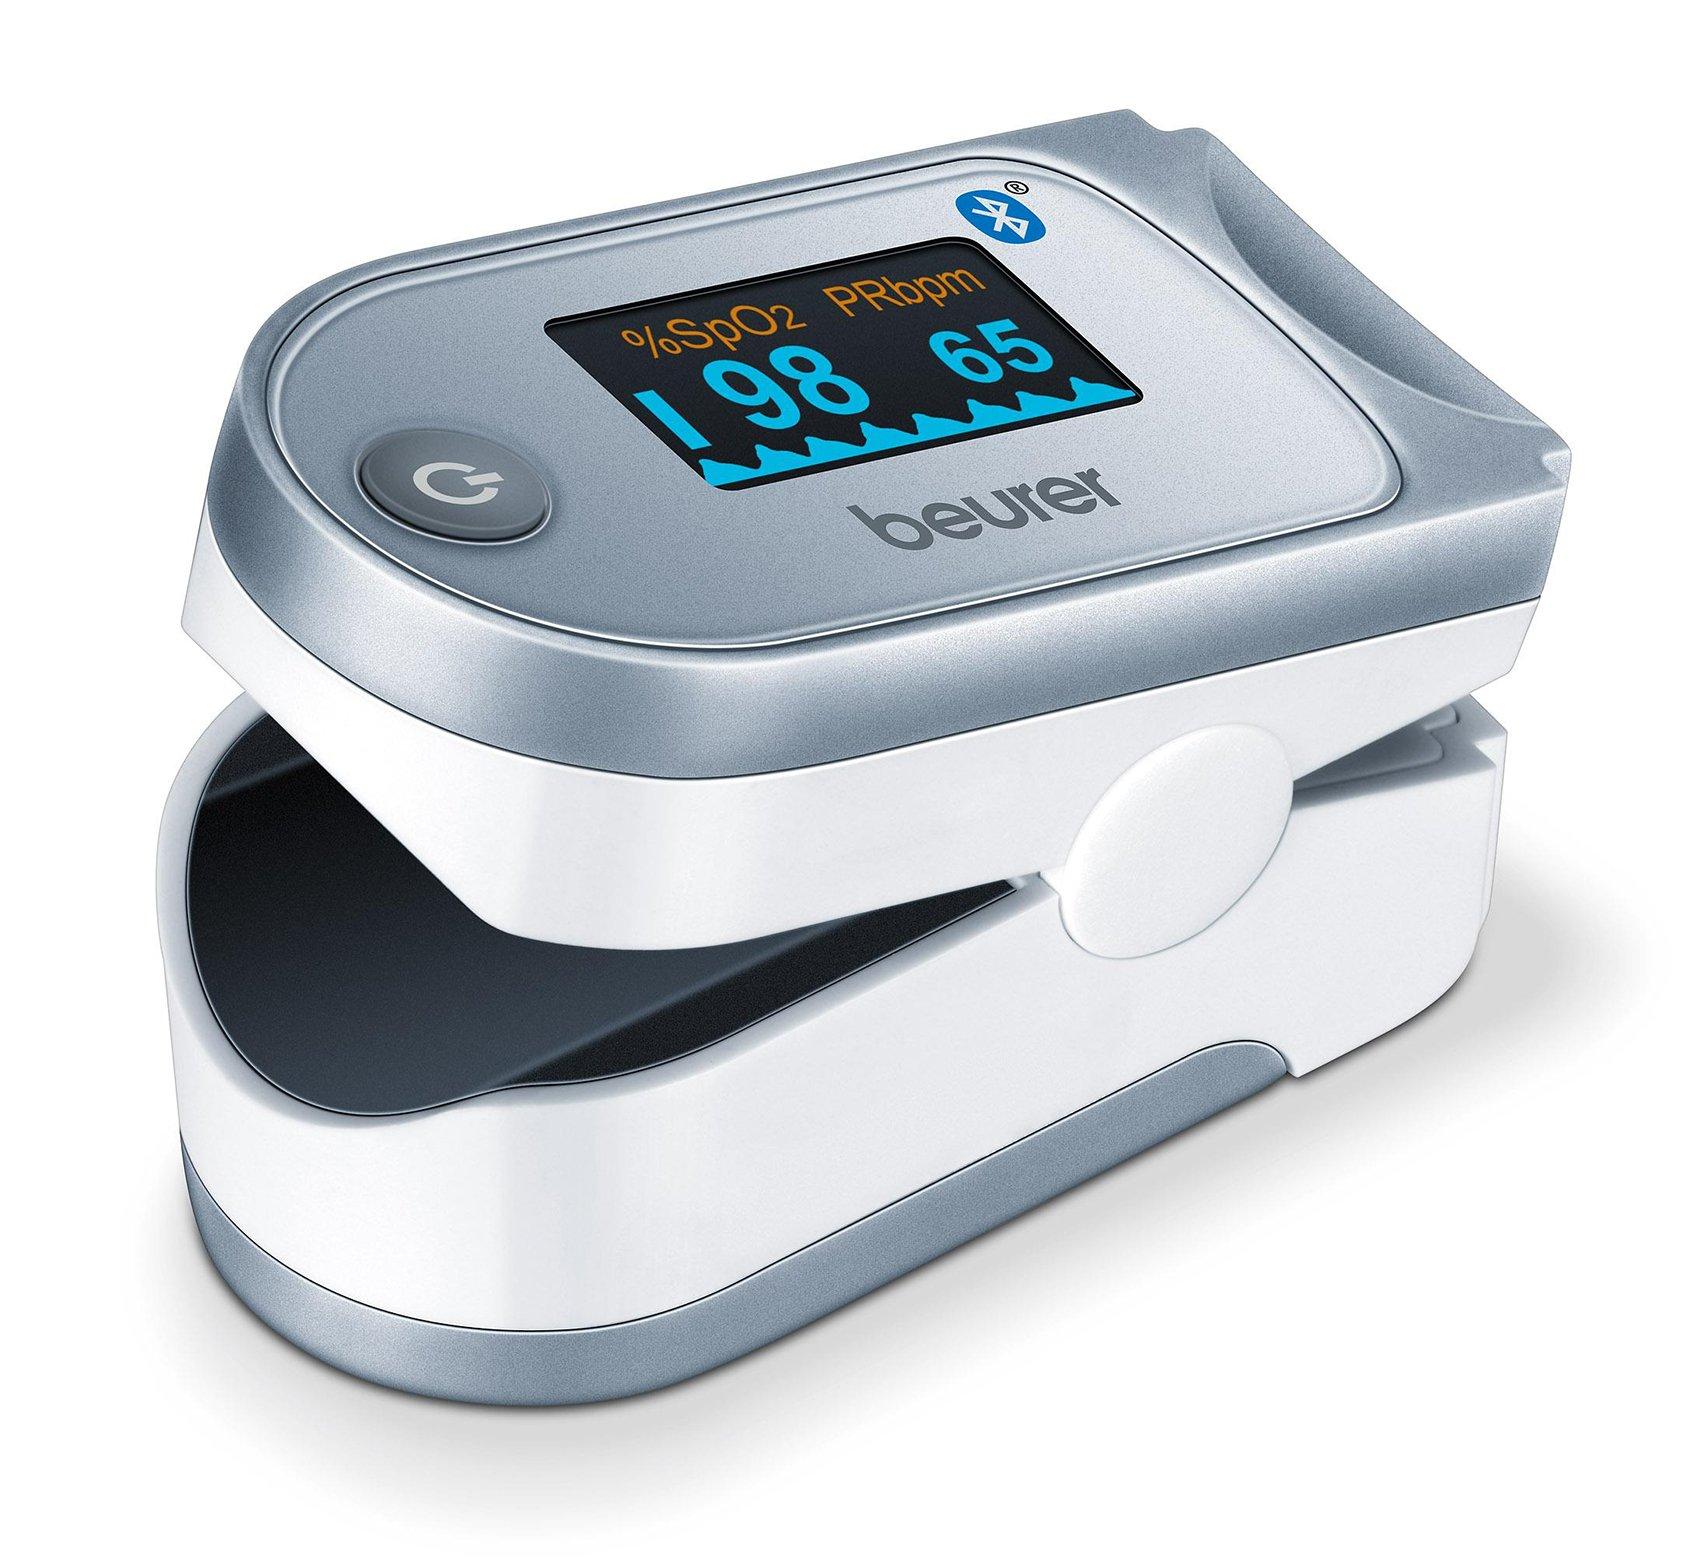 Beurer – Lampara infrarrojos compacta, 100 W, 5 niveles inclinacion